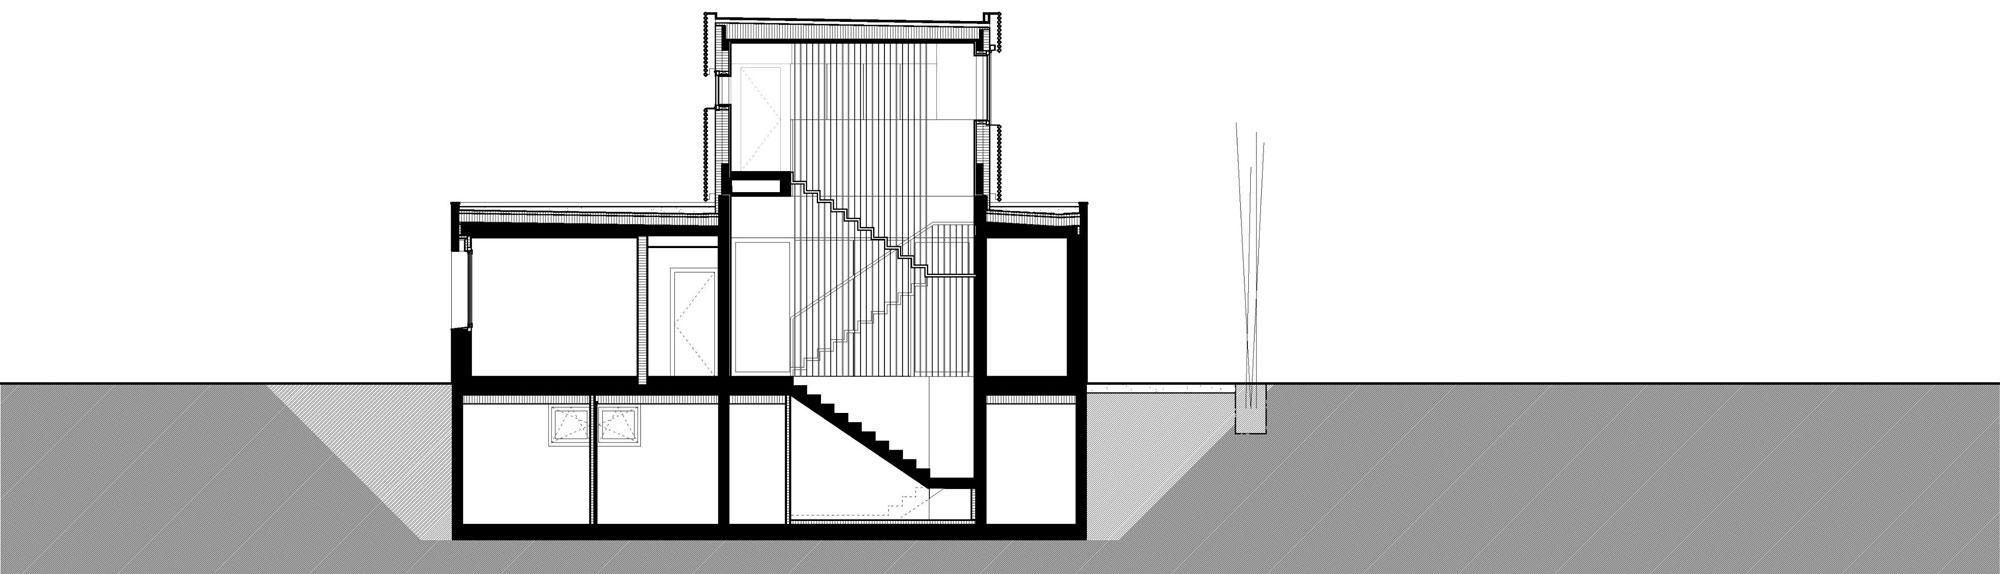 Minergie Villa Christian von Düring architecte-32